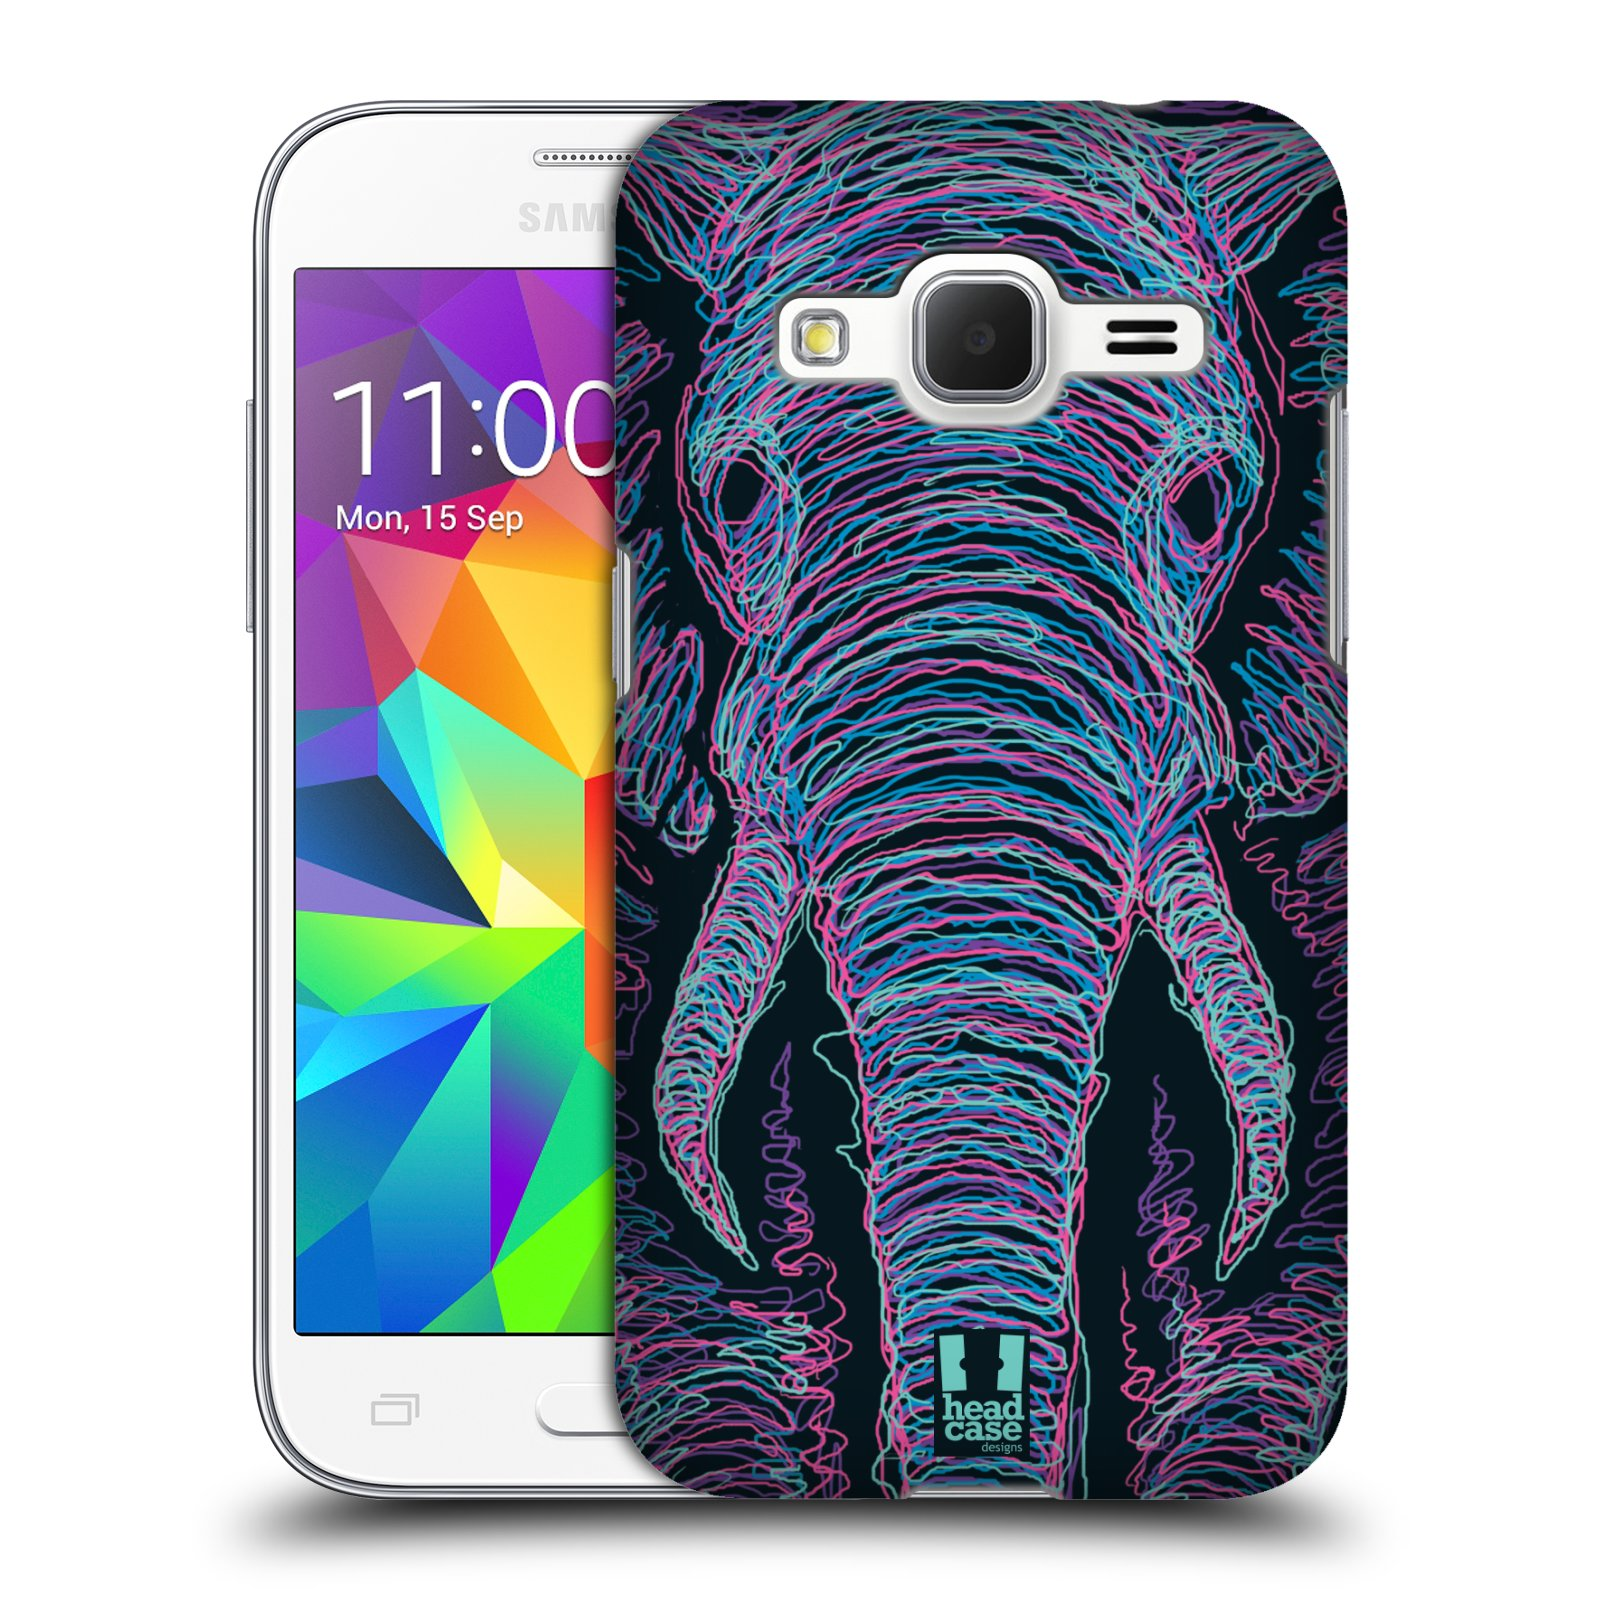 HEAD CASE plastový obal na mobil SAMSUNG GALAXY Core Prime (Core Prime VE) vzor zvíře čmáranice slon